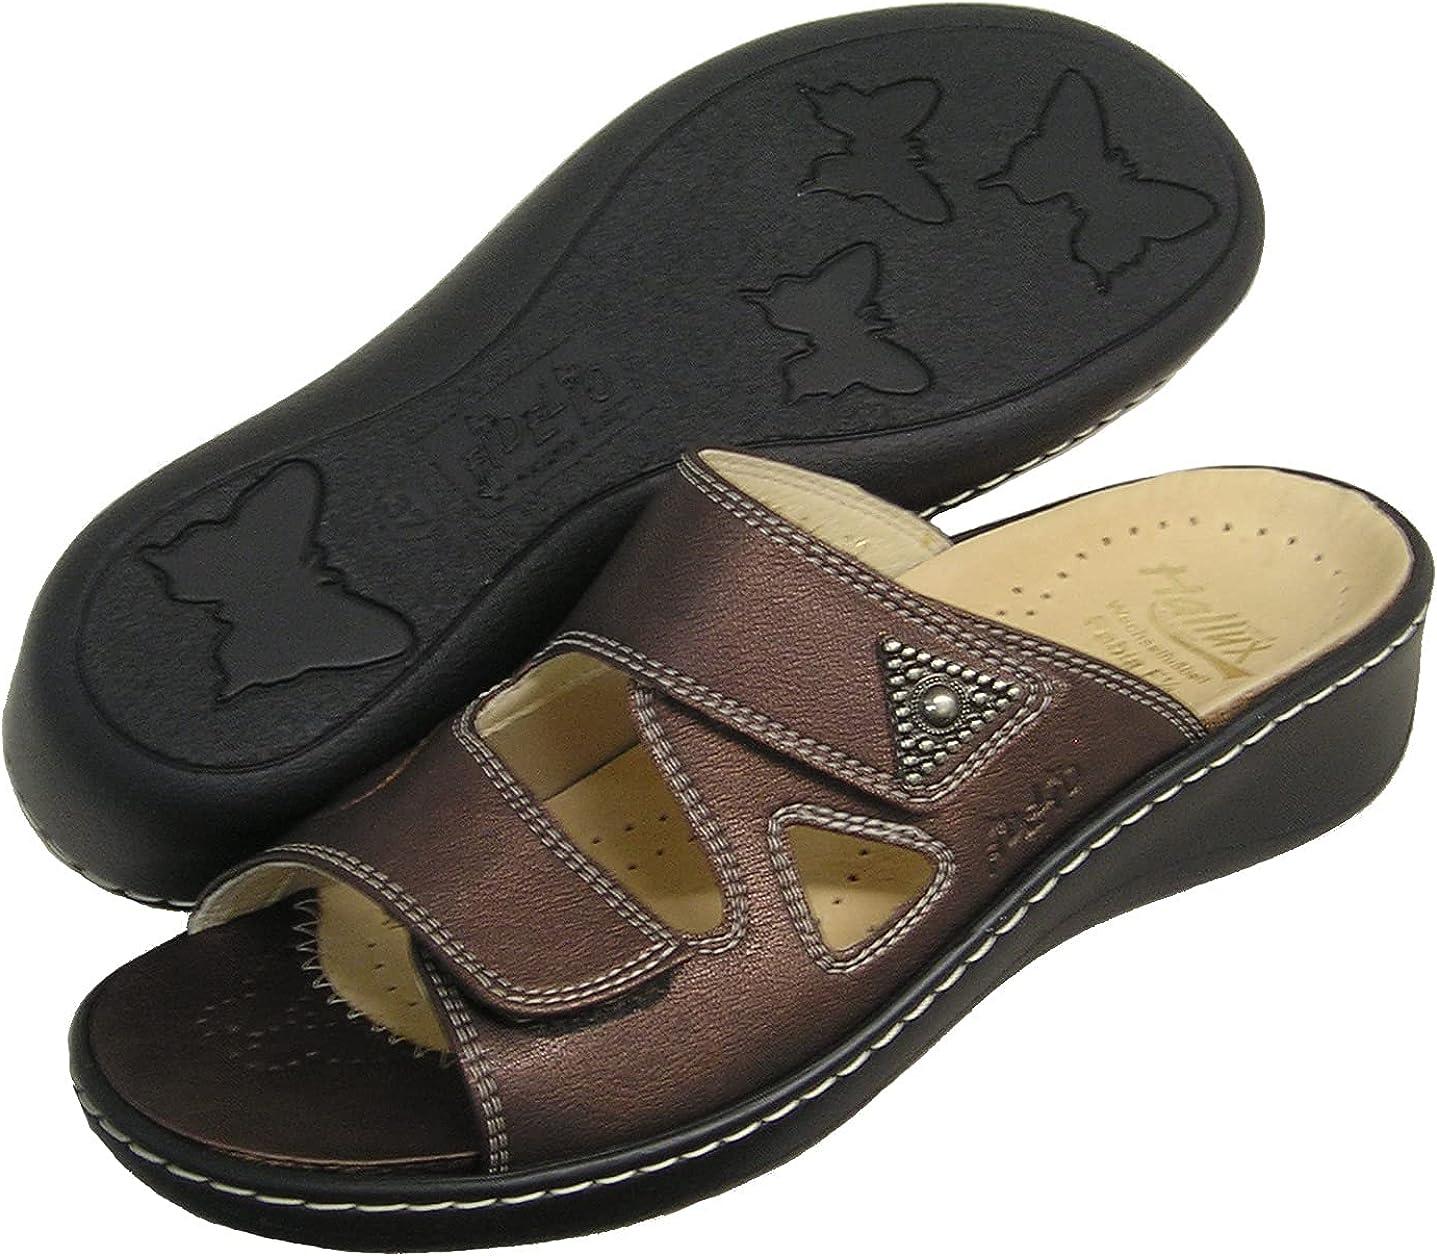 Fidelio Women's Hallux Fabia Bunion Relief Slide Sandal 33709 (Marrone)